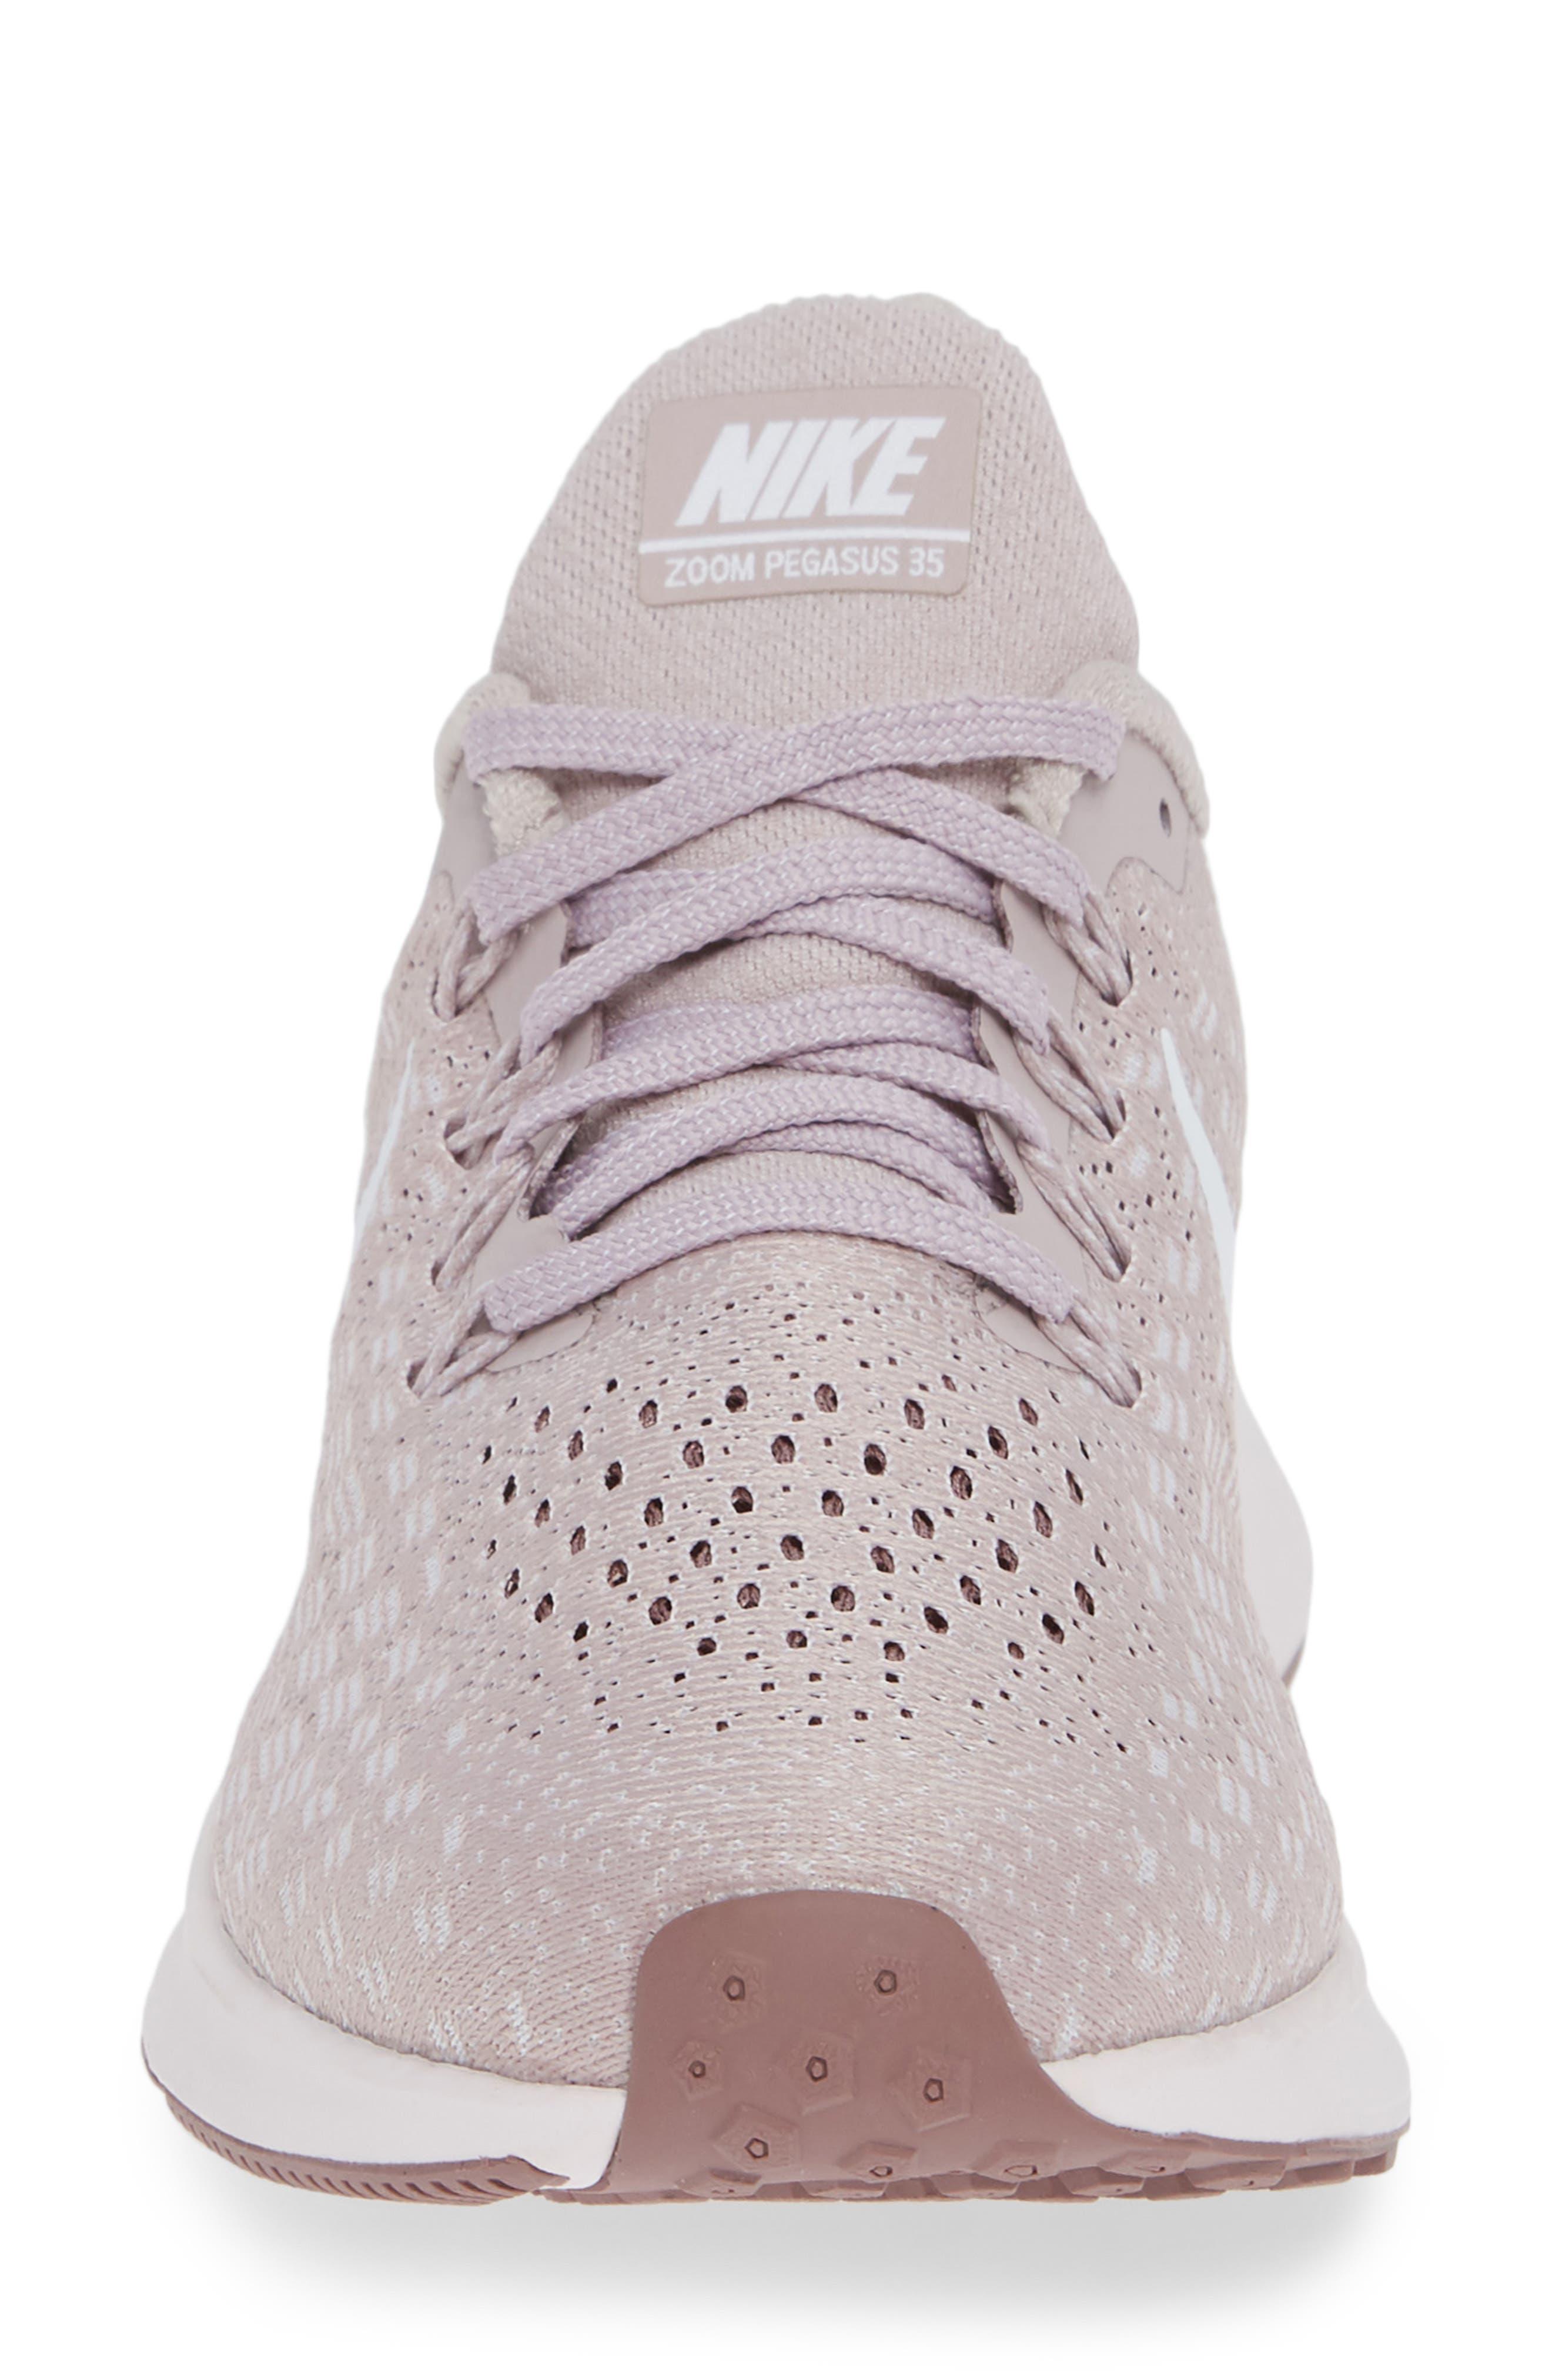 NIKE,                             Air Zoom Pegasus 35 Running Shoe,                             Alternate thumbnail 4, color,                             ROSE/ WHITE-SMOKEY MAUVE